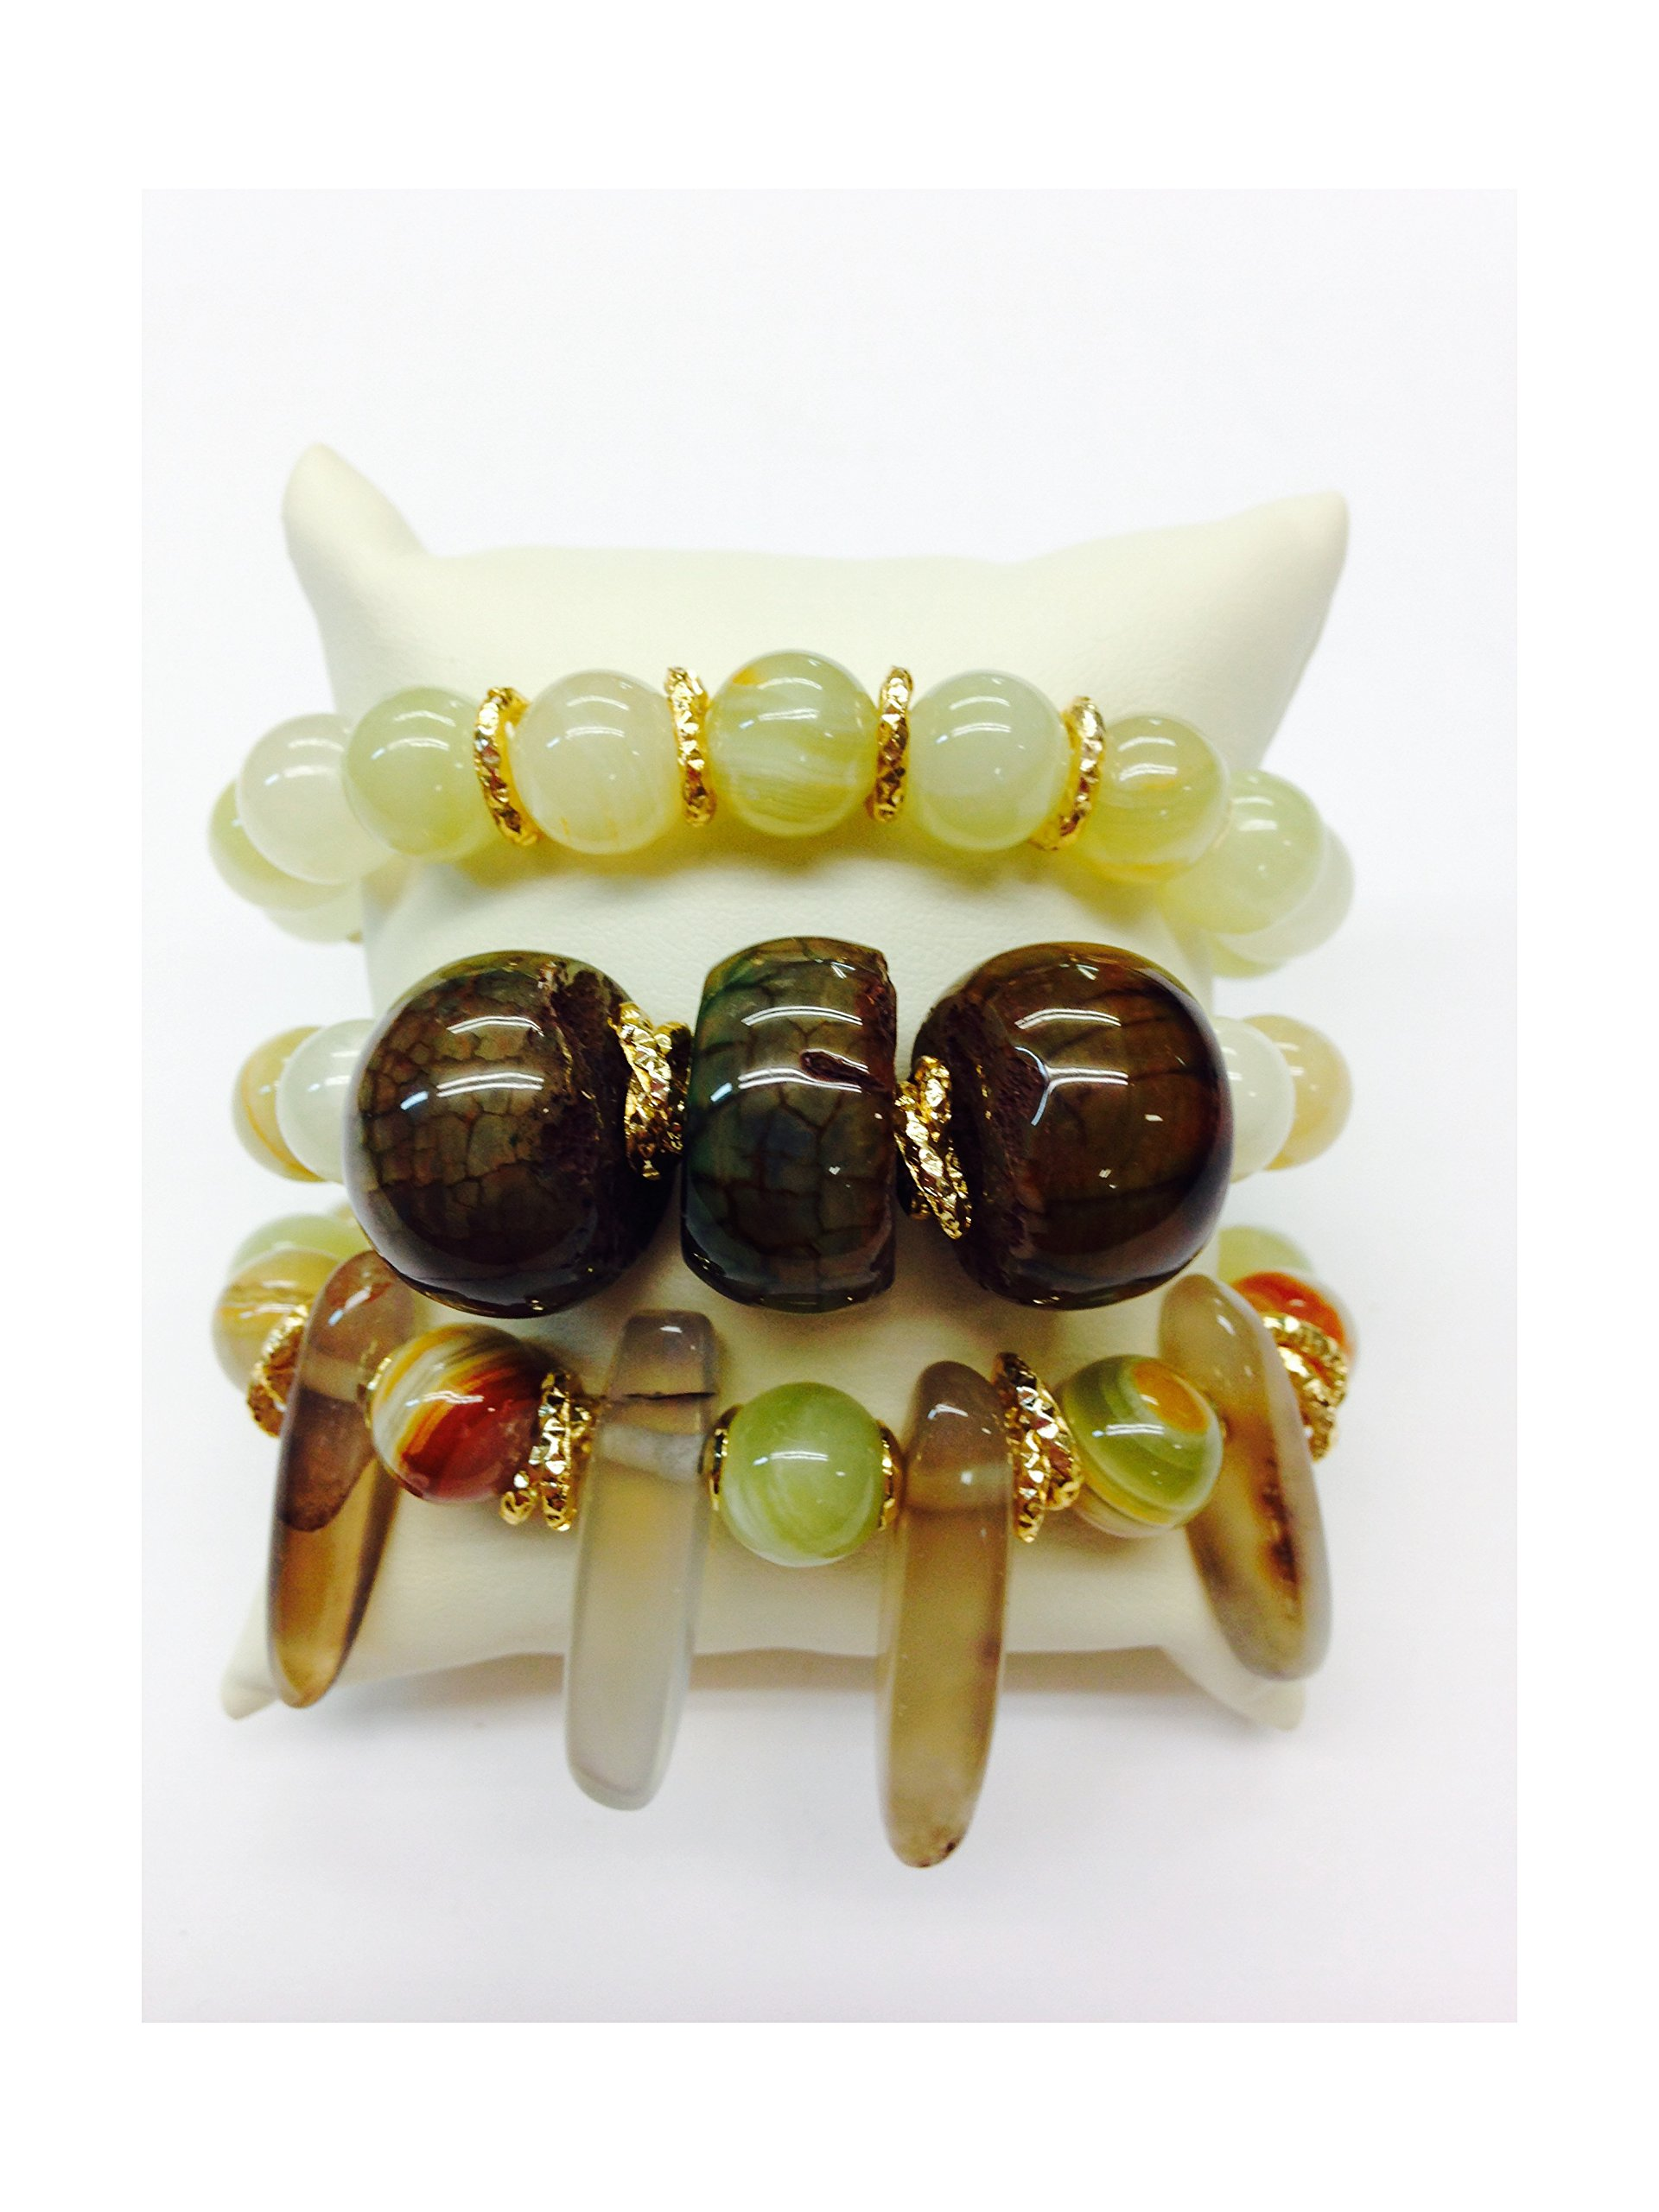 Set of 3 Handmade Bracelets - Jade, Exotic Rare Agate and Tusk Shaped Quartz Natural Stones & Goldfilled Beads by Formula Moda